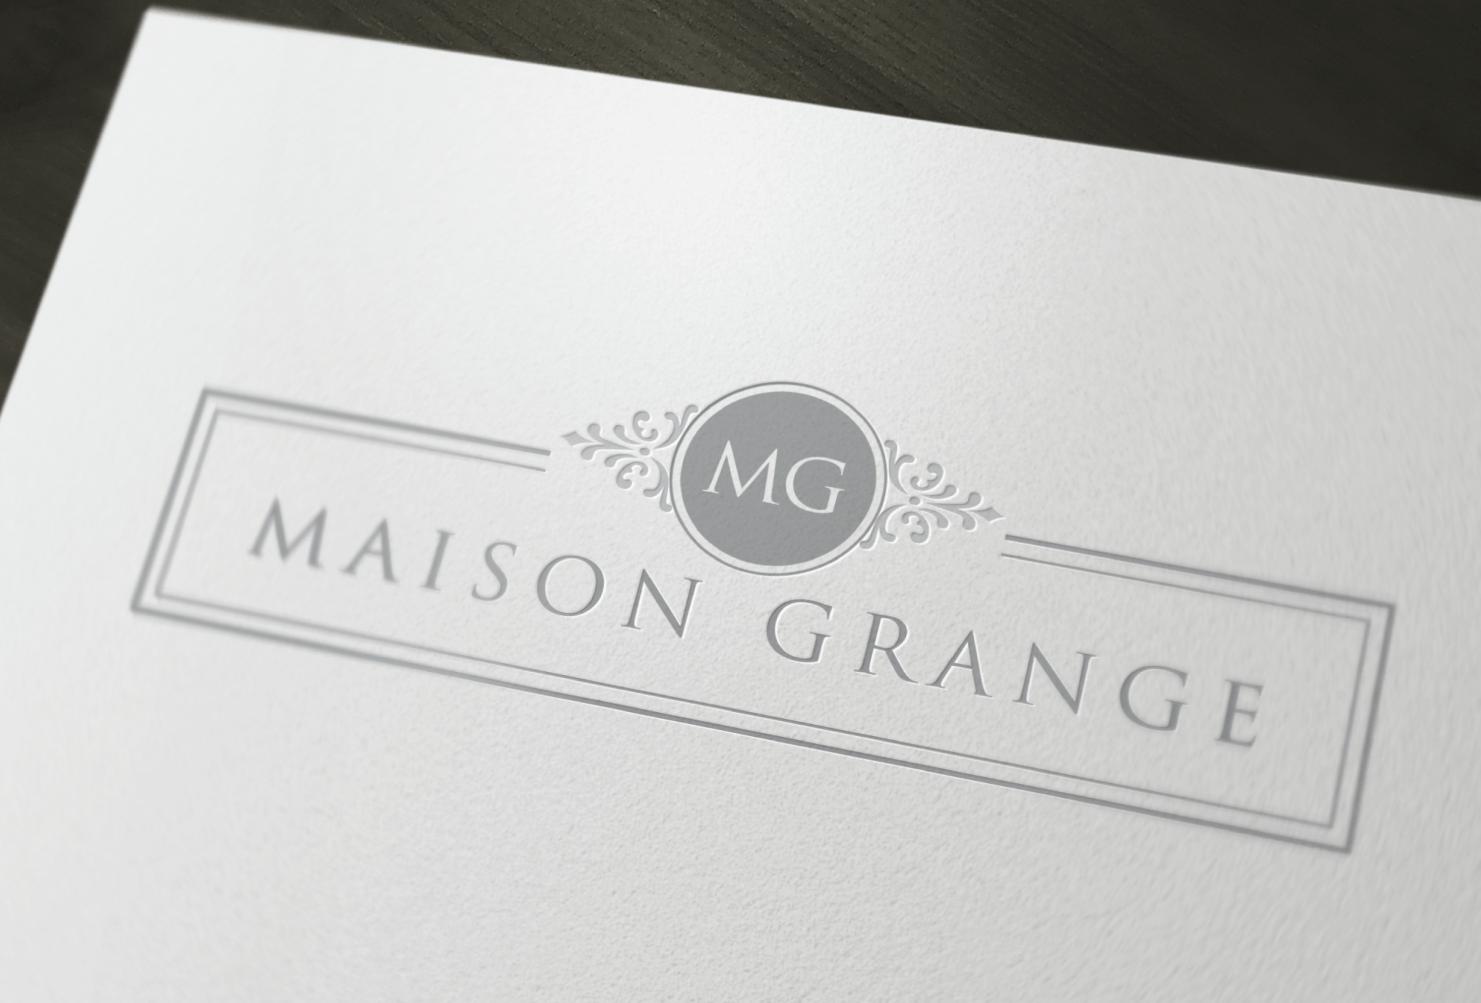 New logo wanted for Maison Grange